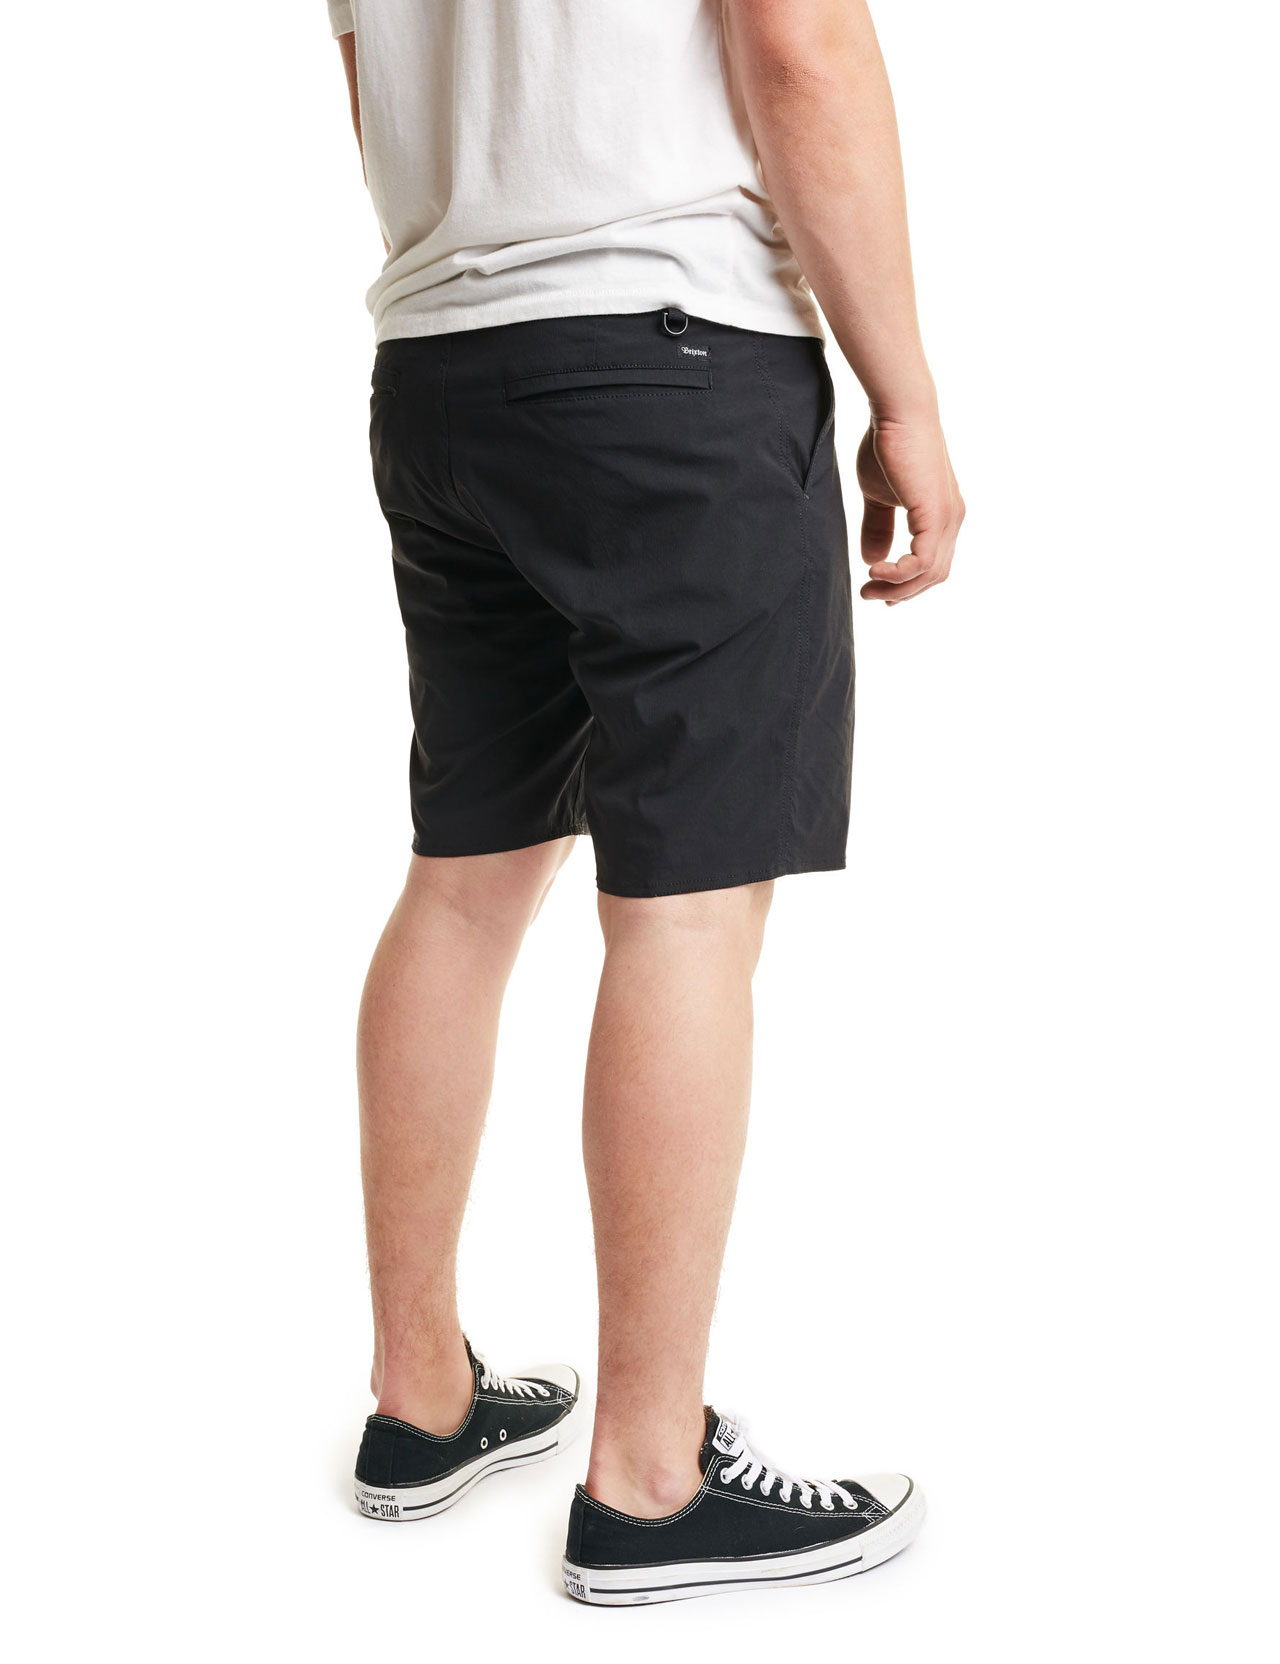 Brixton - Toil II AT Shorts - Black 53d6c16da05